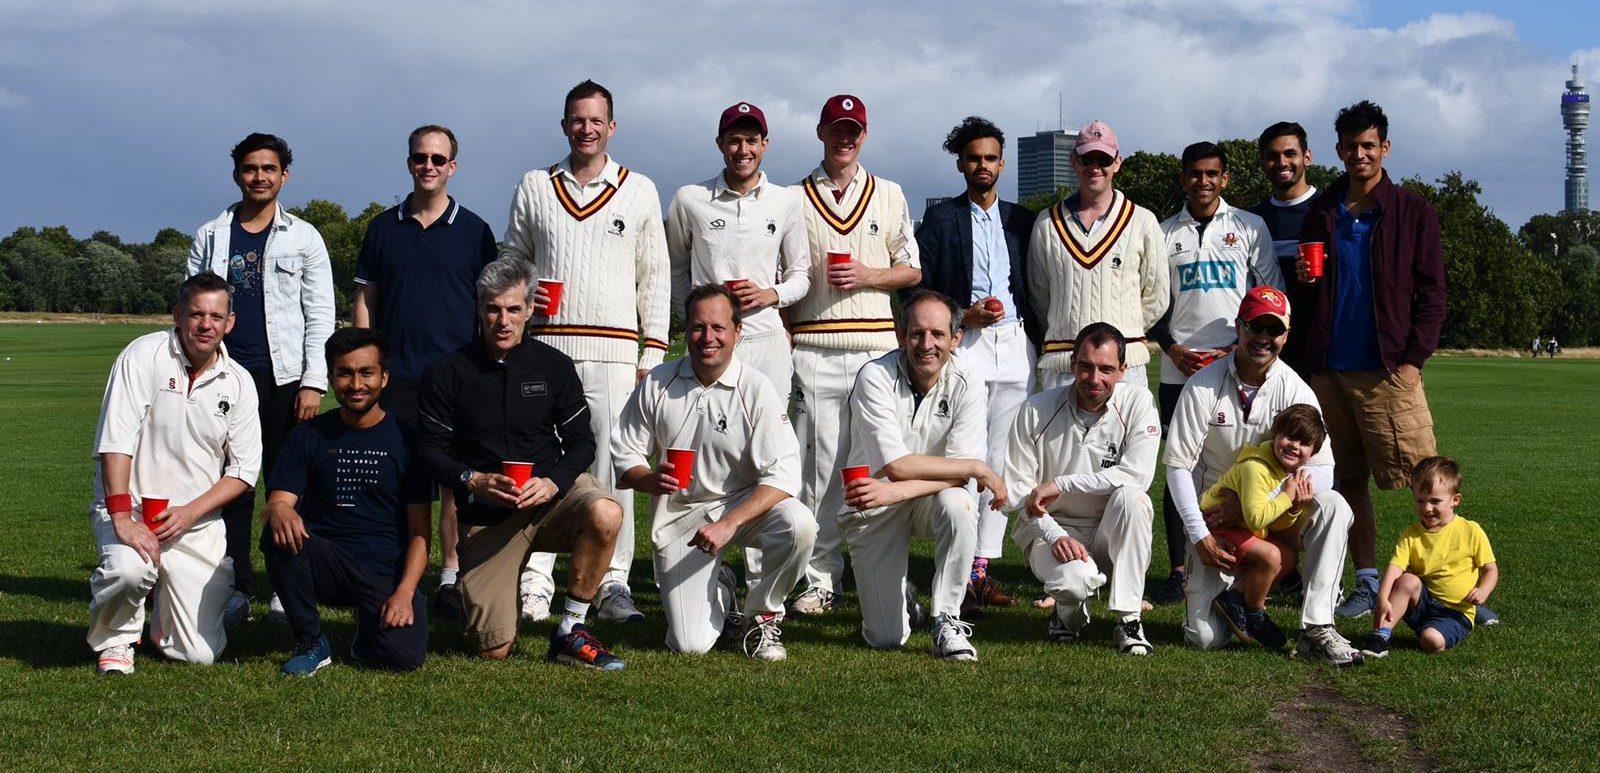 Whalers Cricket Club